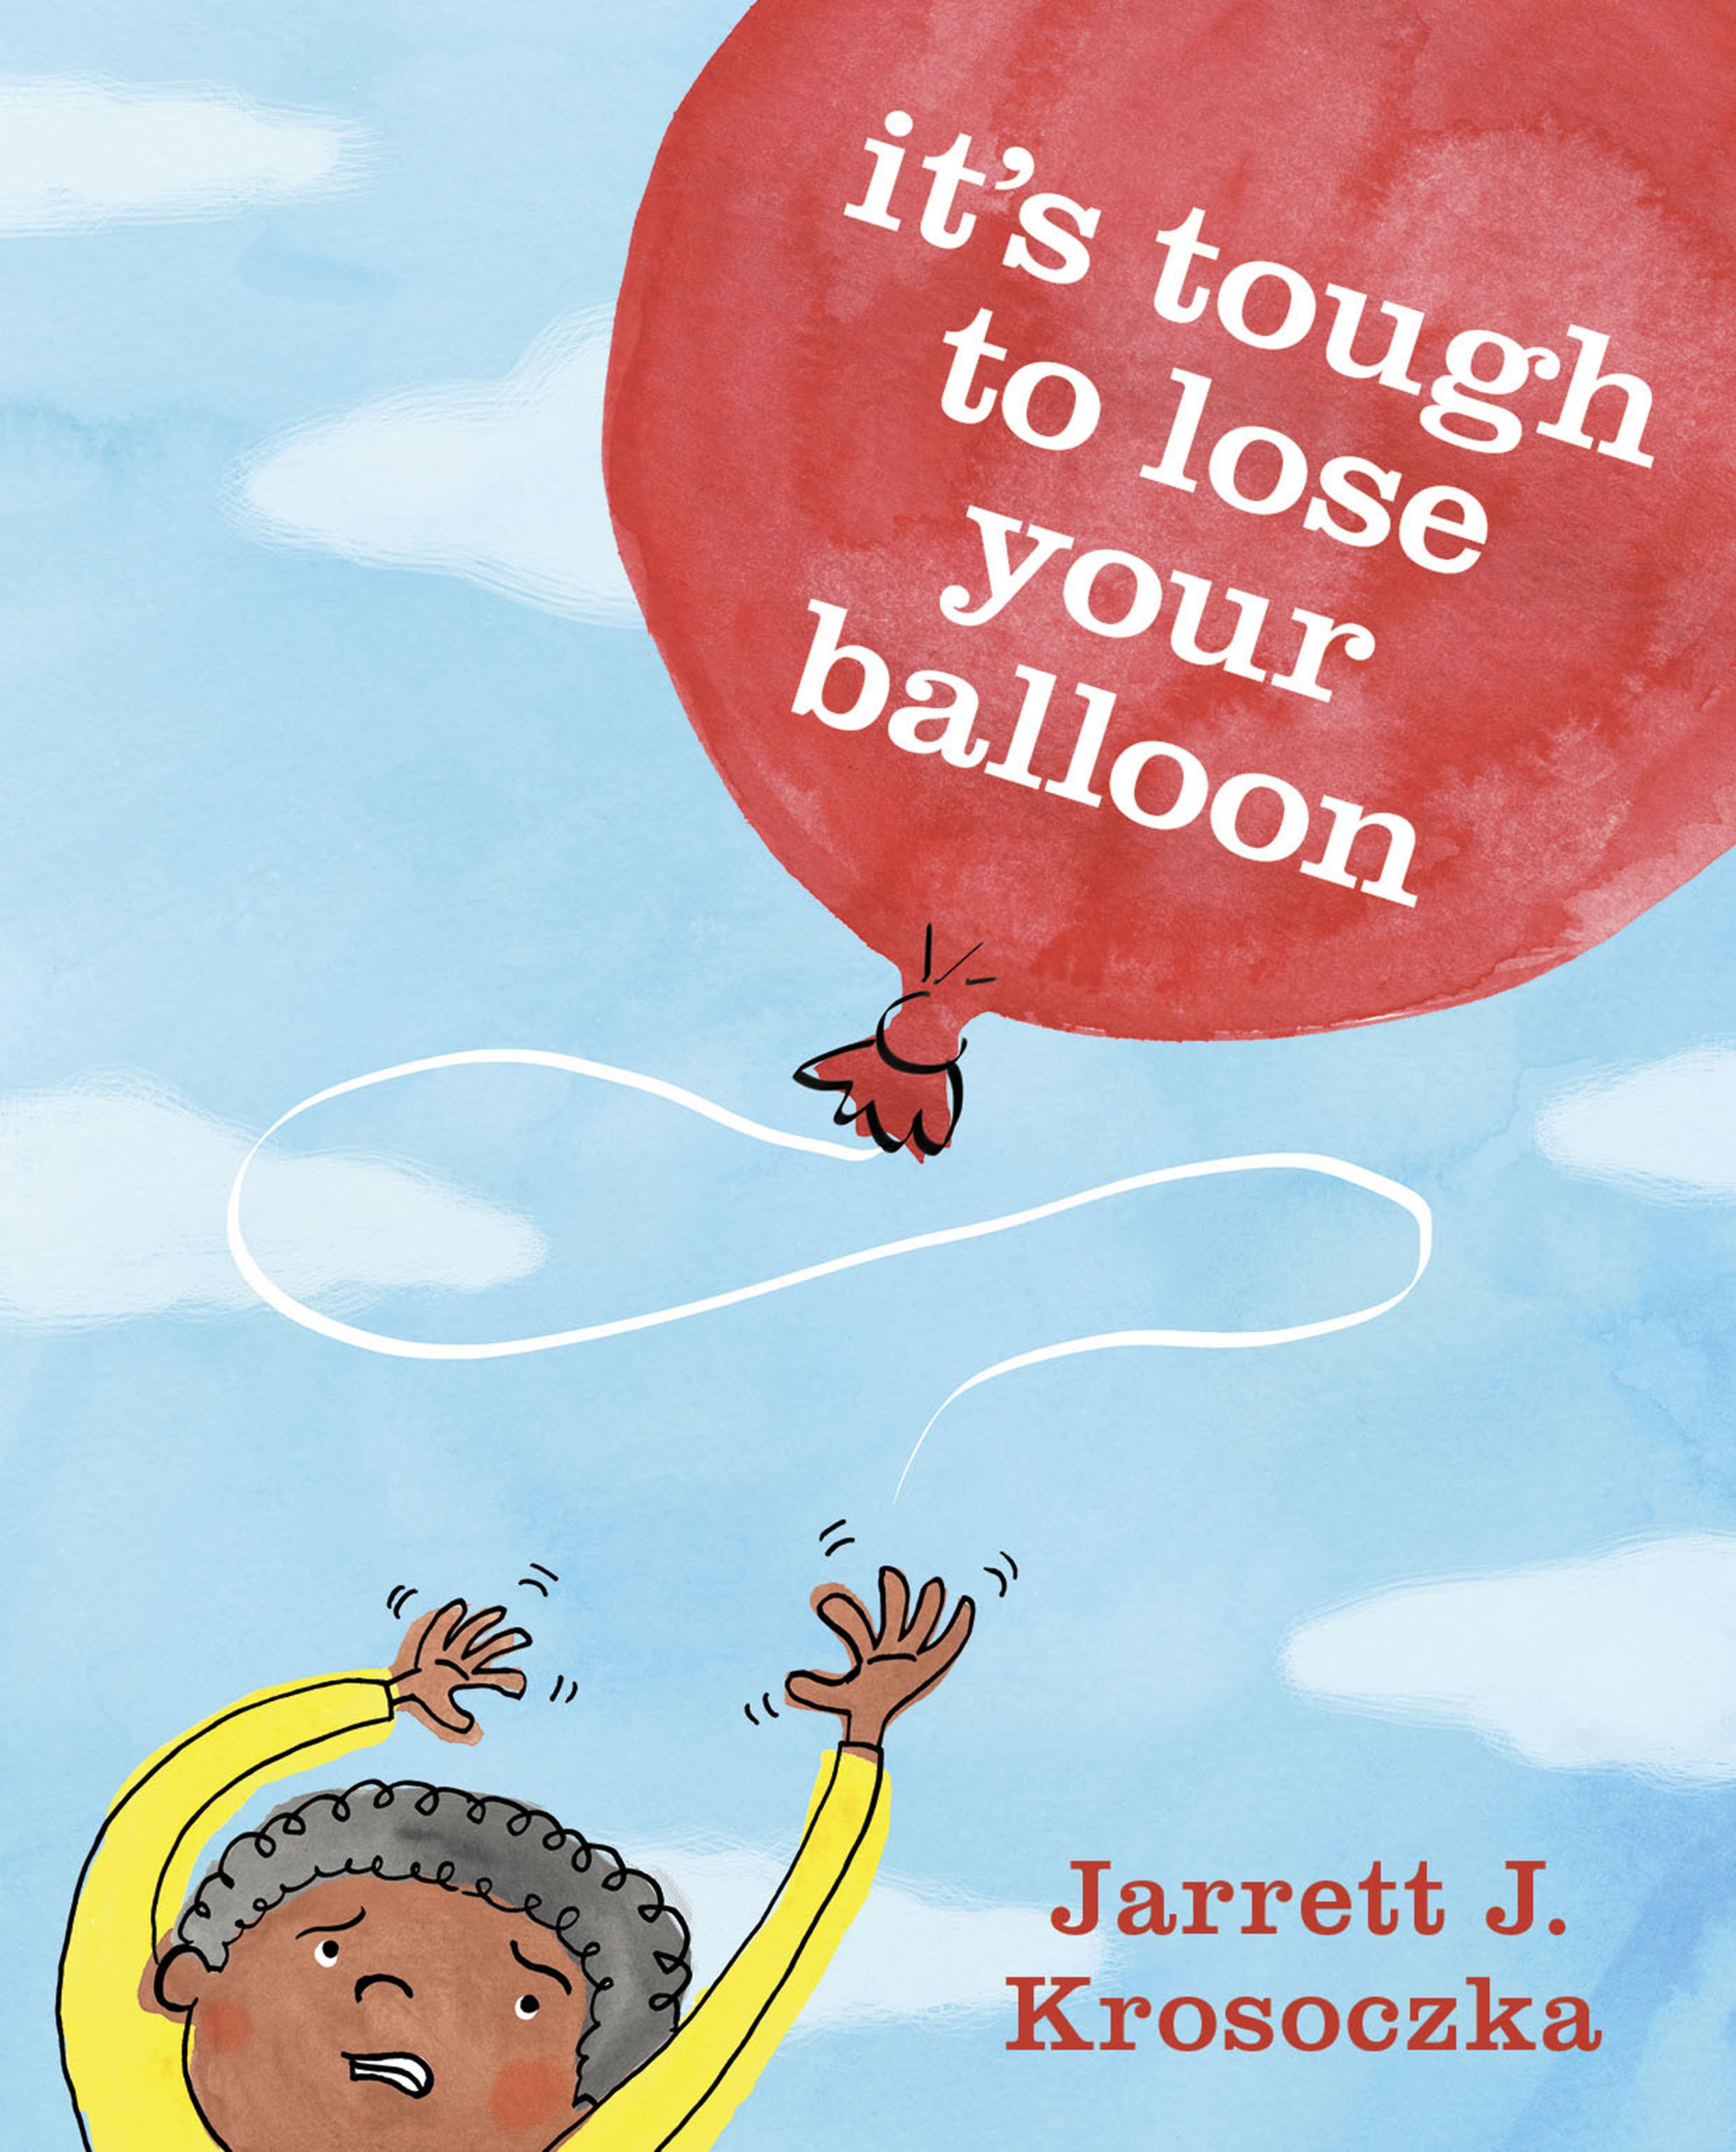 Tough_to_Lose_Your_Balloon_jkt.jpg